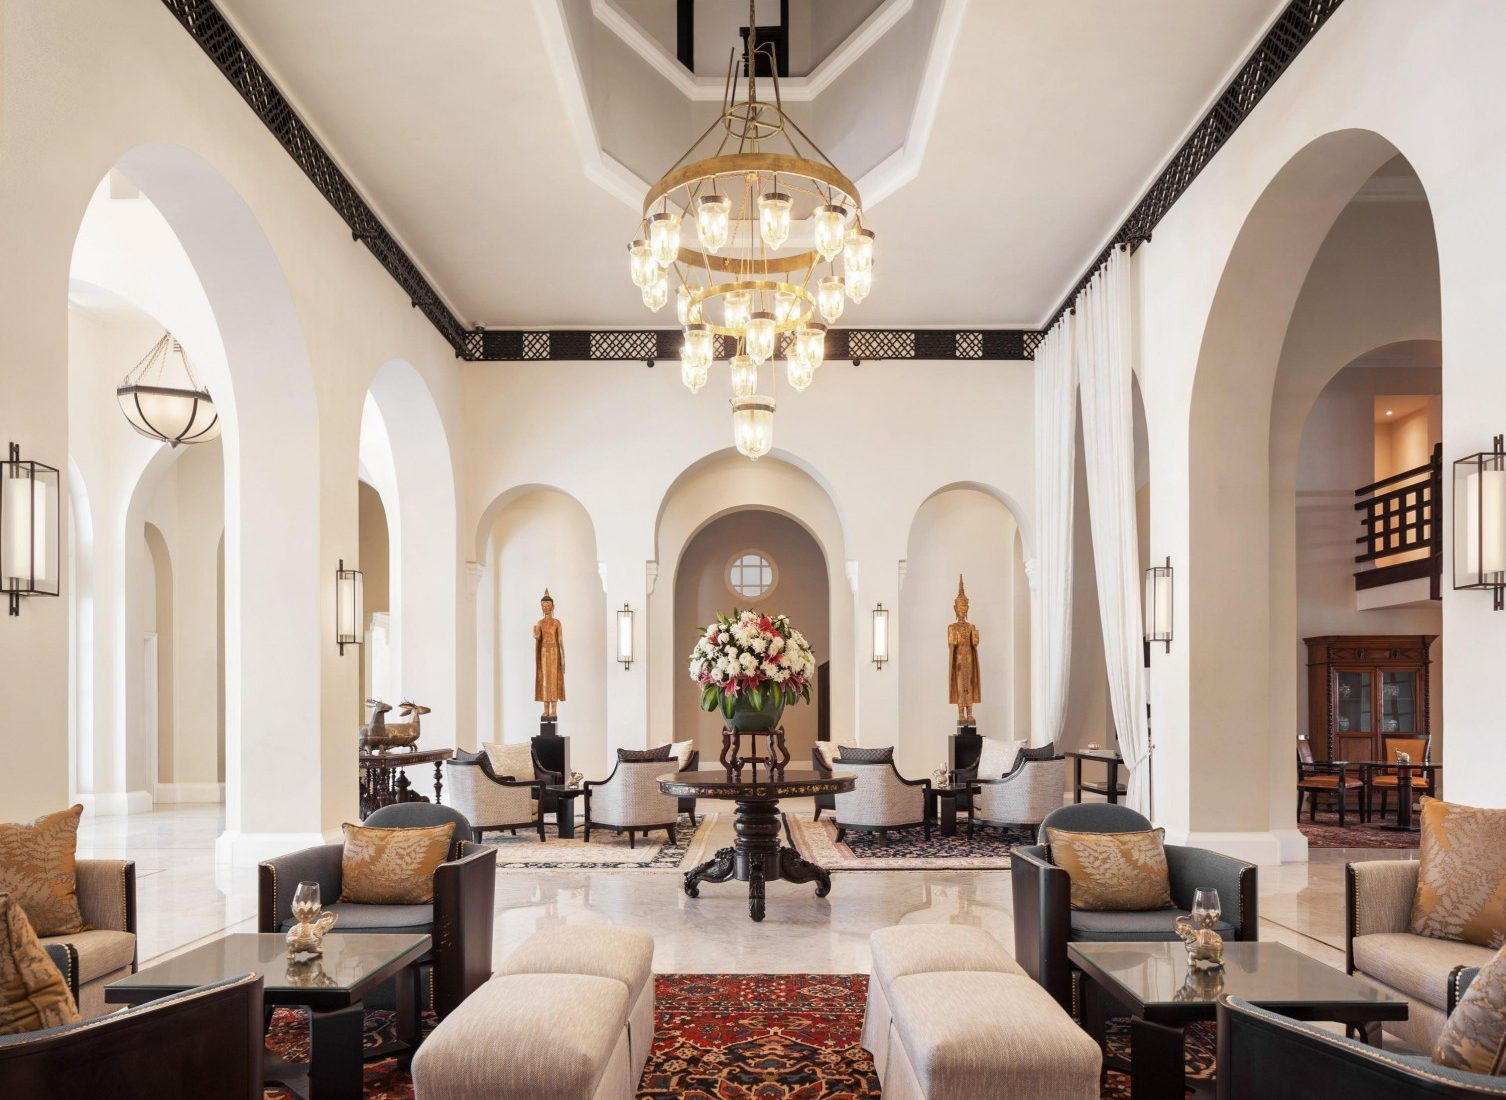 Raffles Hotel Le Royal Phnom Penh - The Conservatory